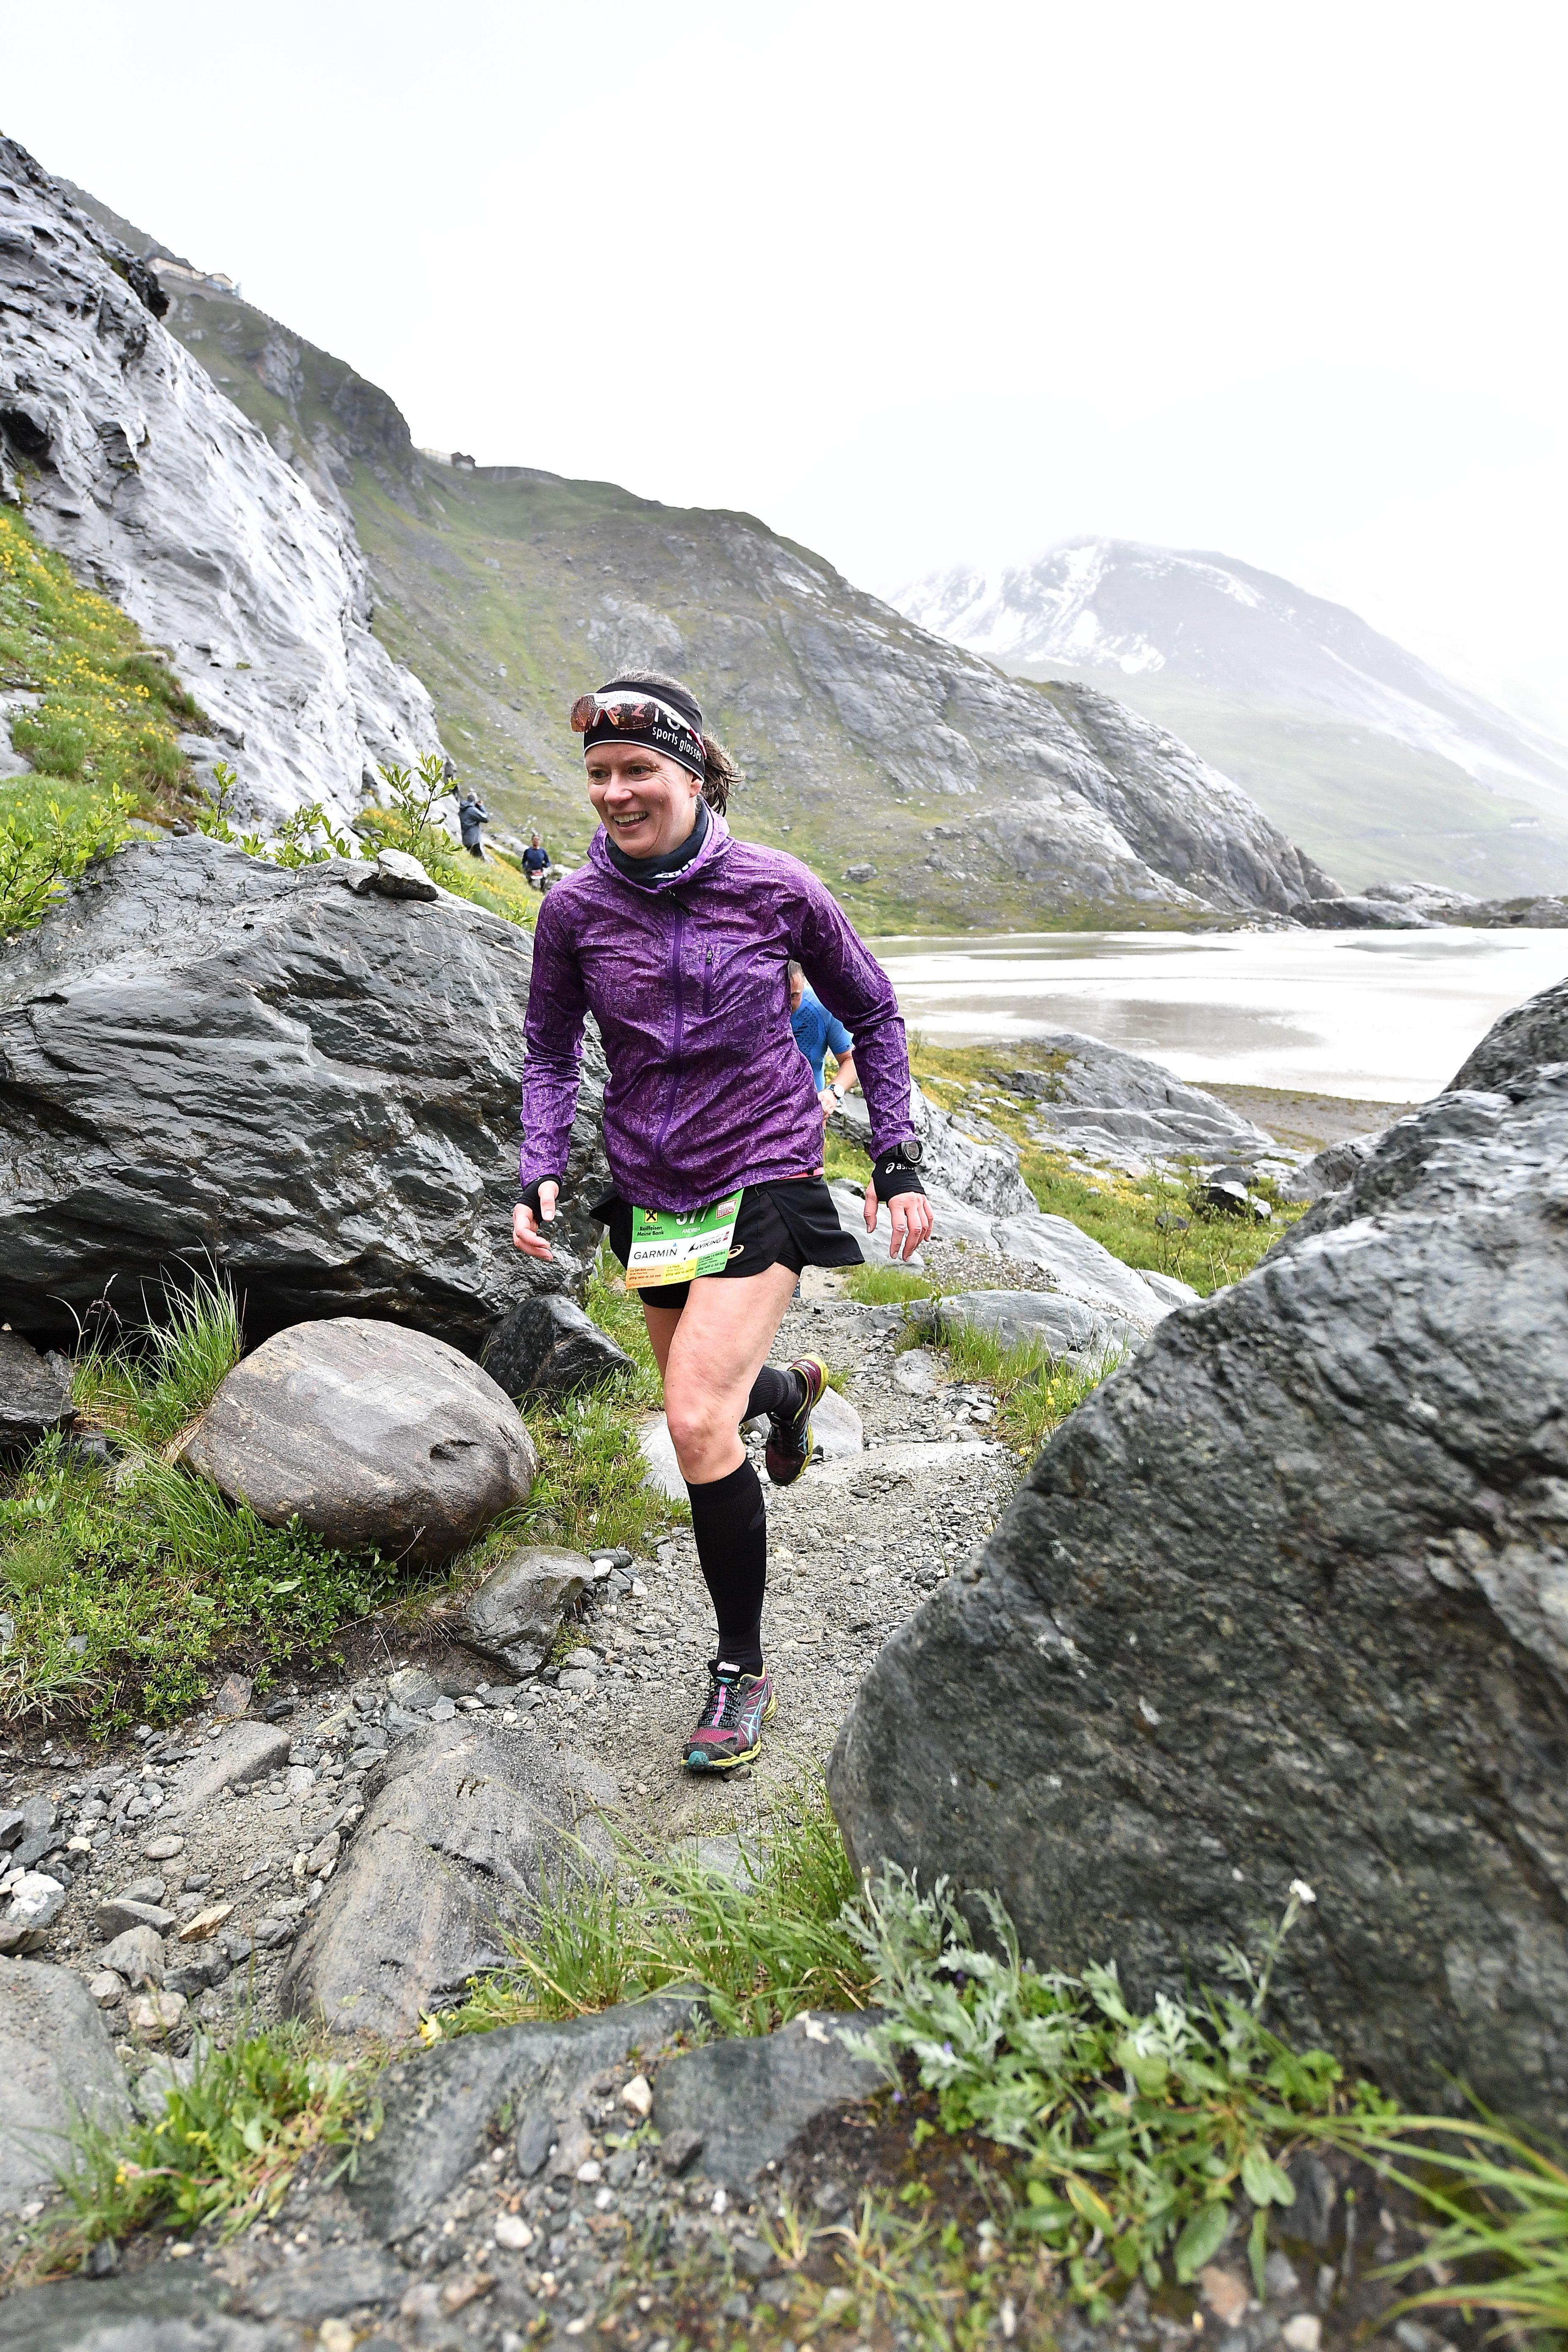 Kurz und knackig: Mythos Großglockner Berglauf